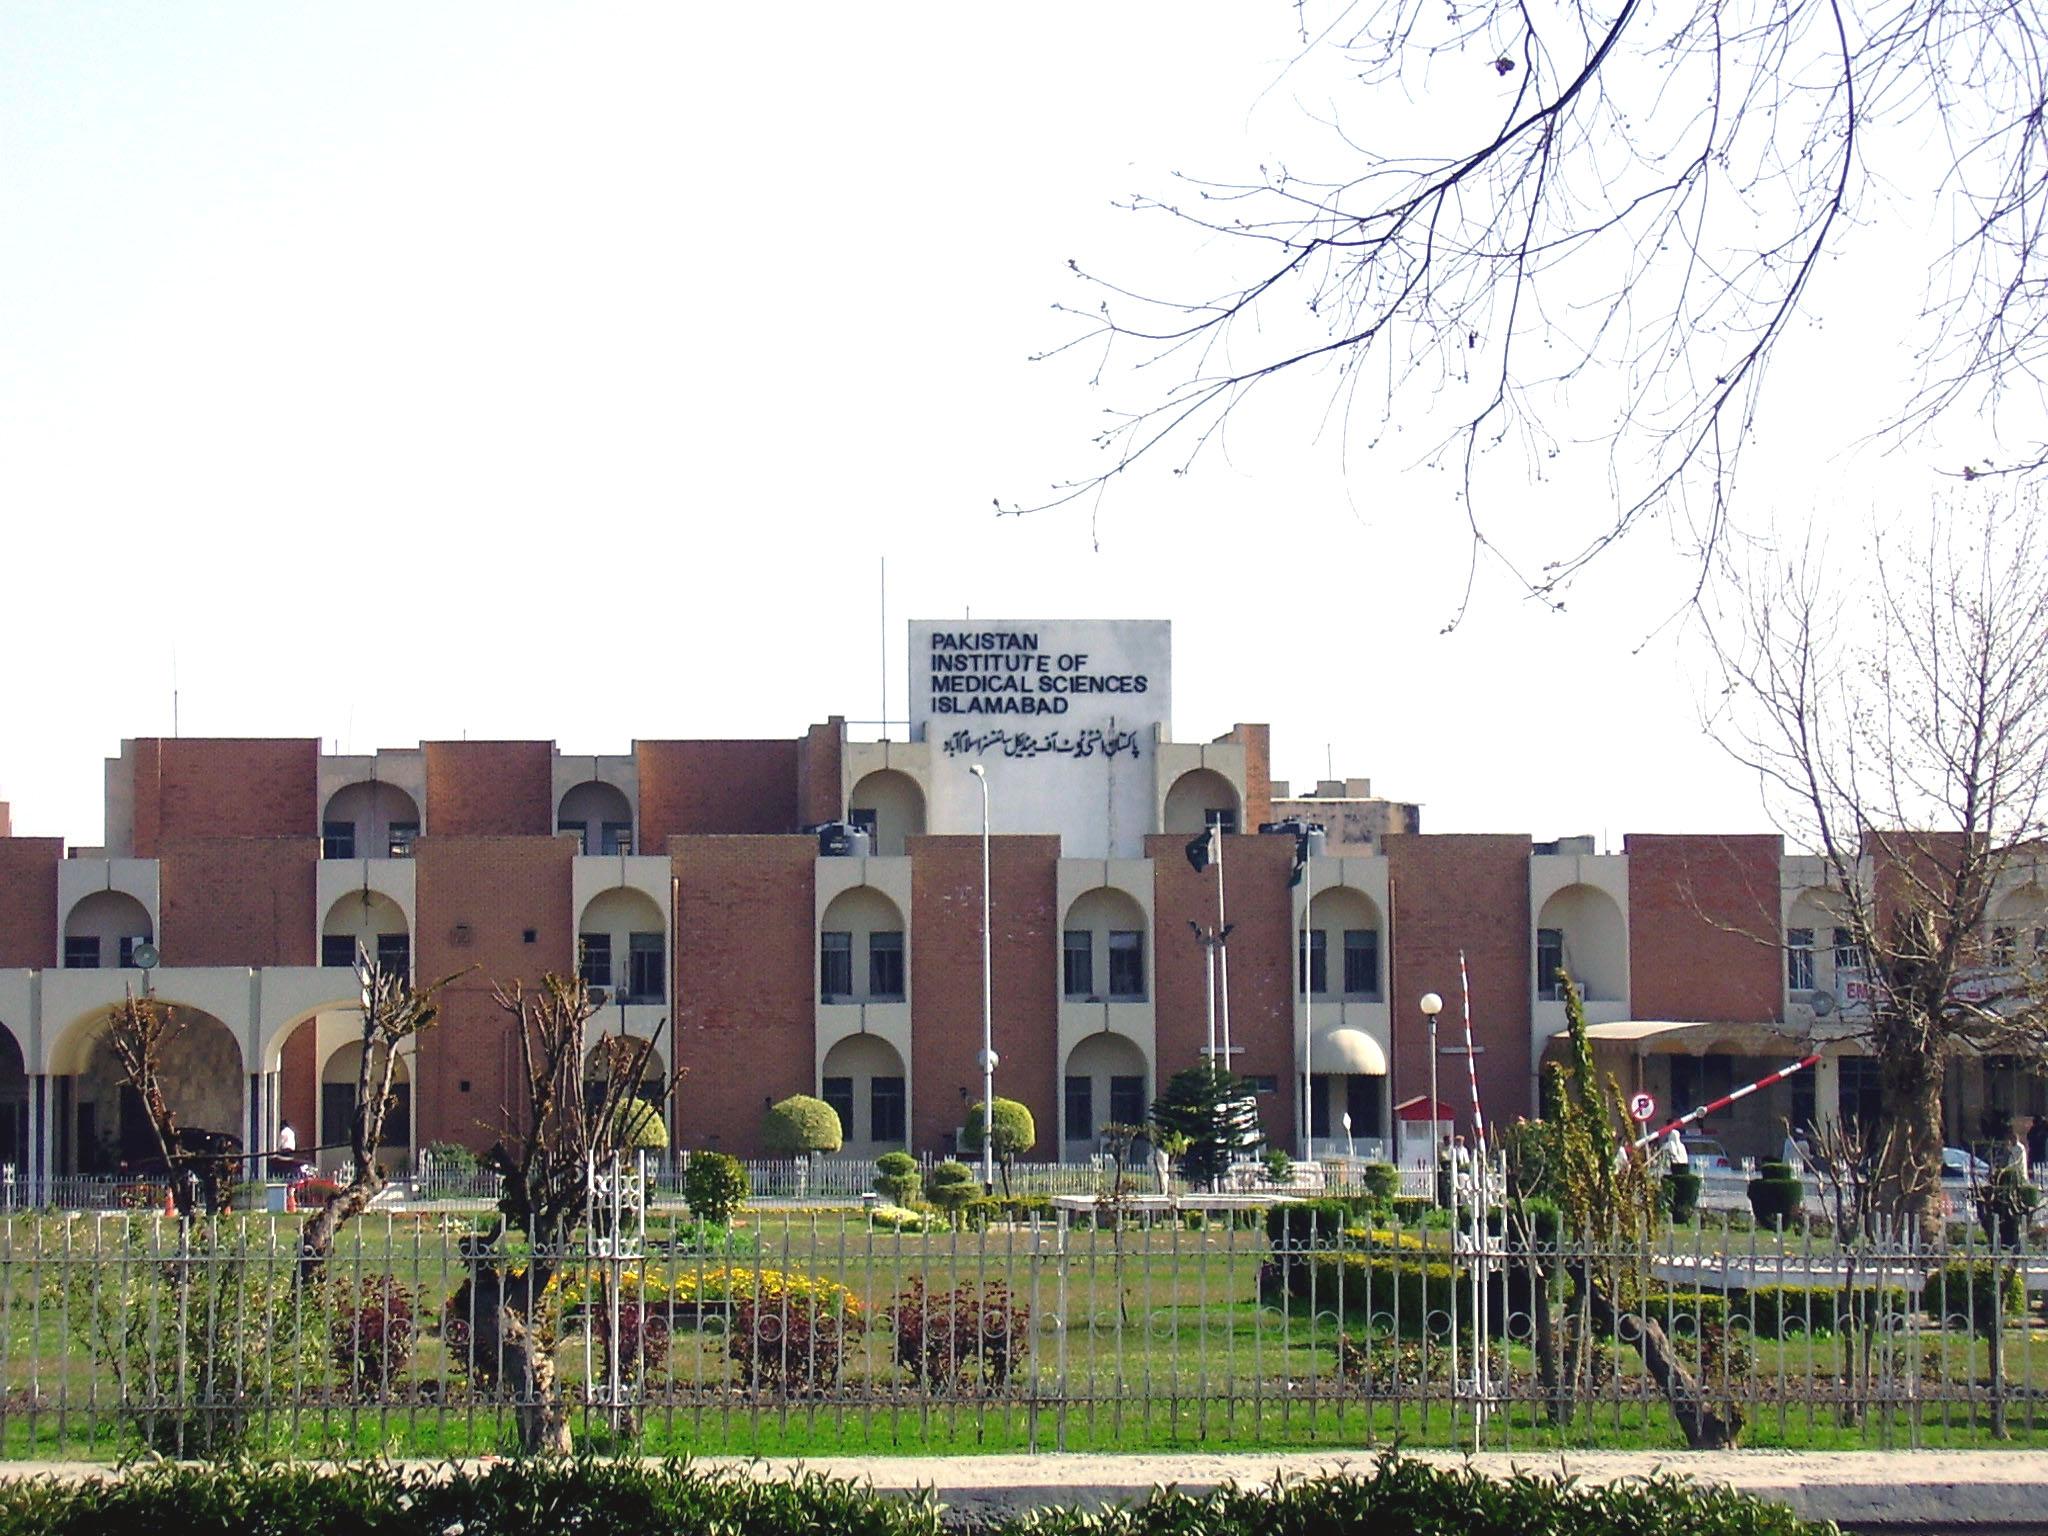 Pakistan Institute of Medical Sciences - Wikipedia